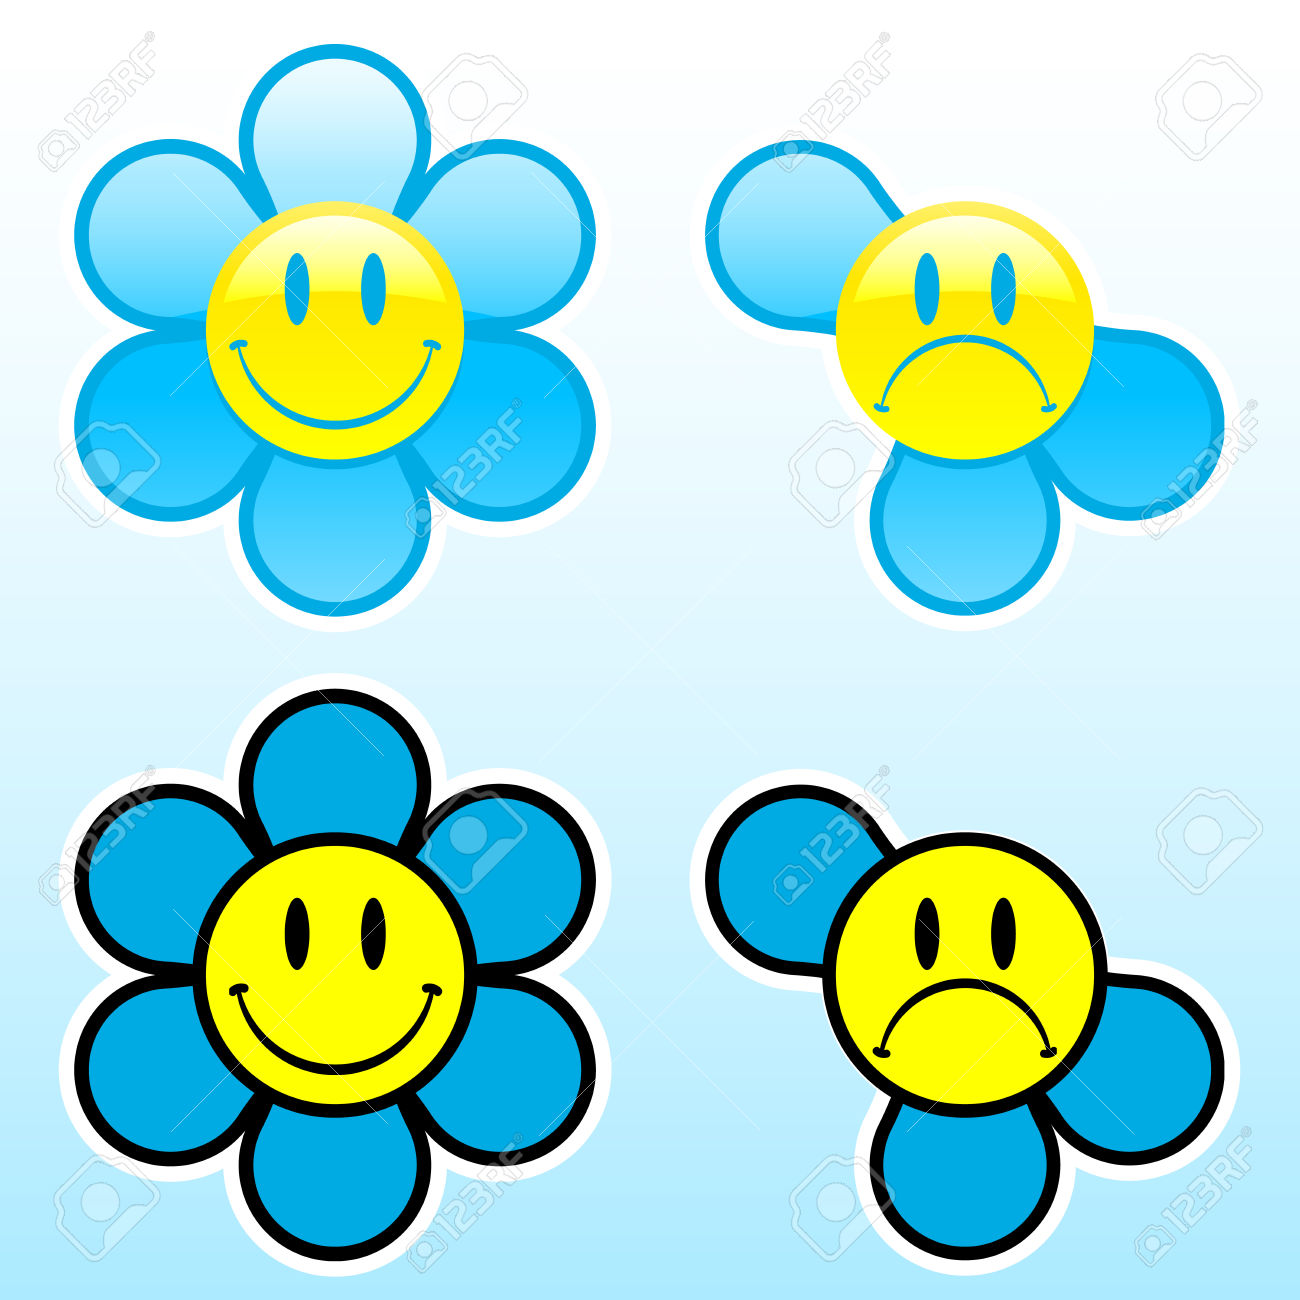 1300x1300 Best Smiley Face Flower